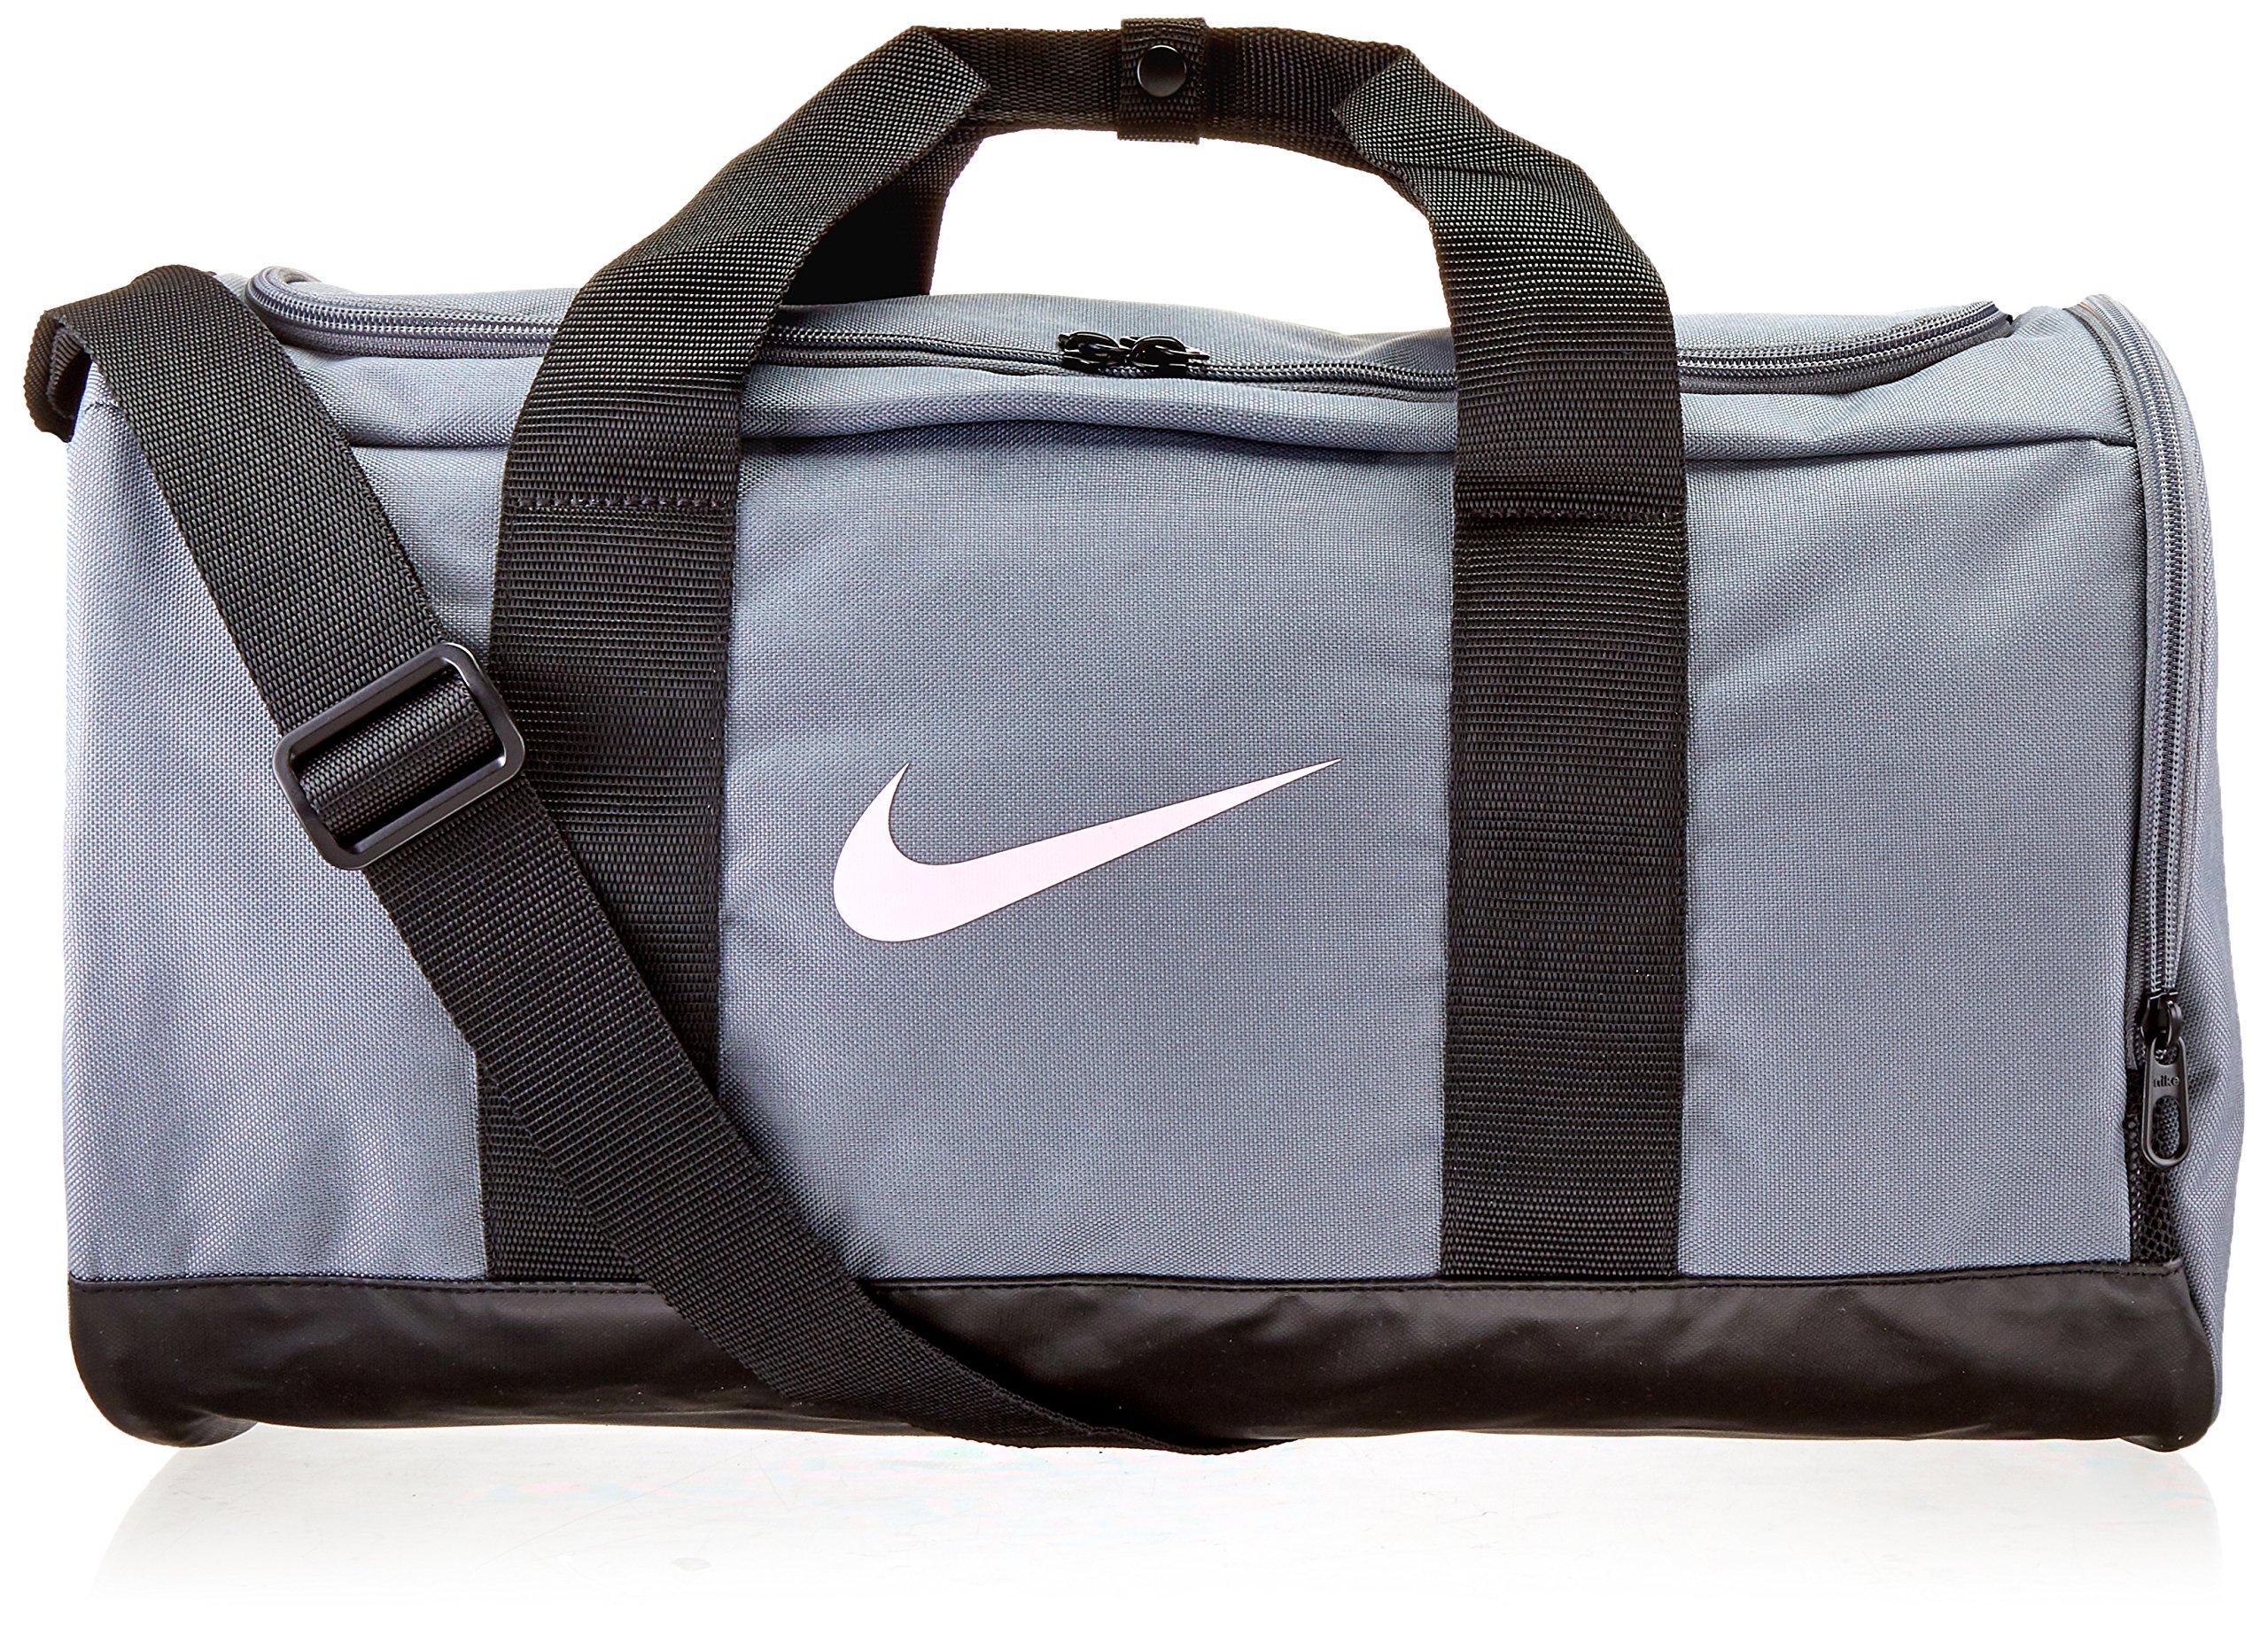 NIKE Team Women's Training Duffel Bag, Cool Grey/Black/Storm Pink, One Size